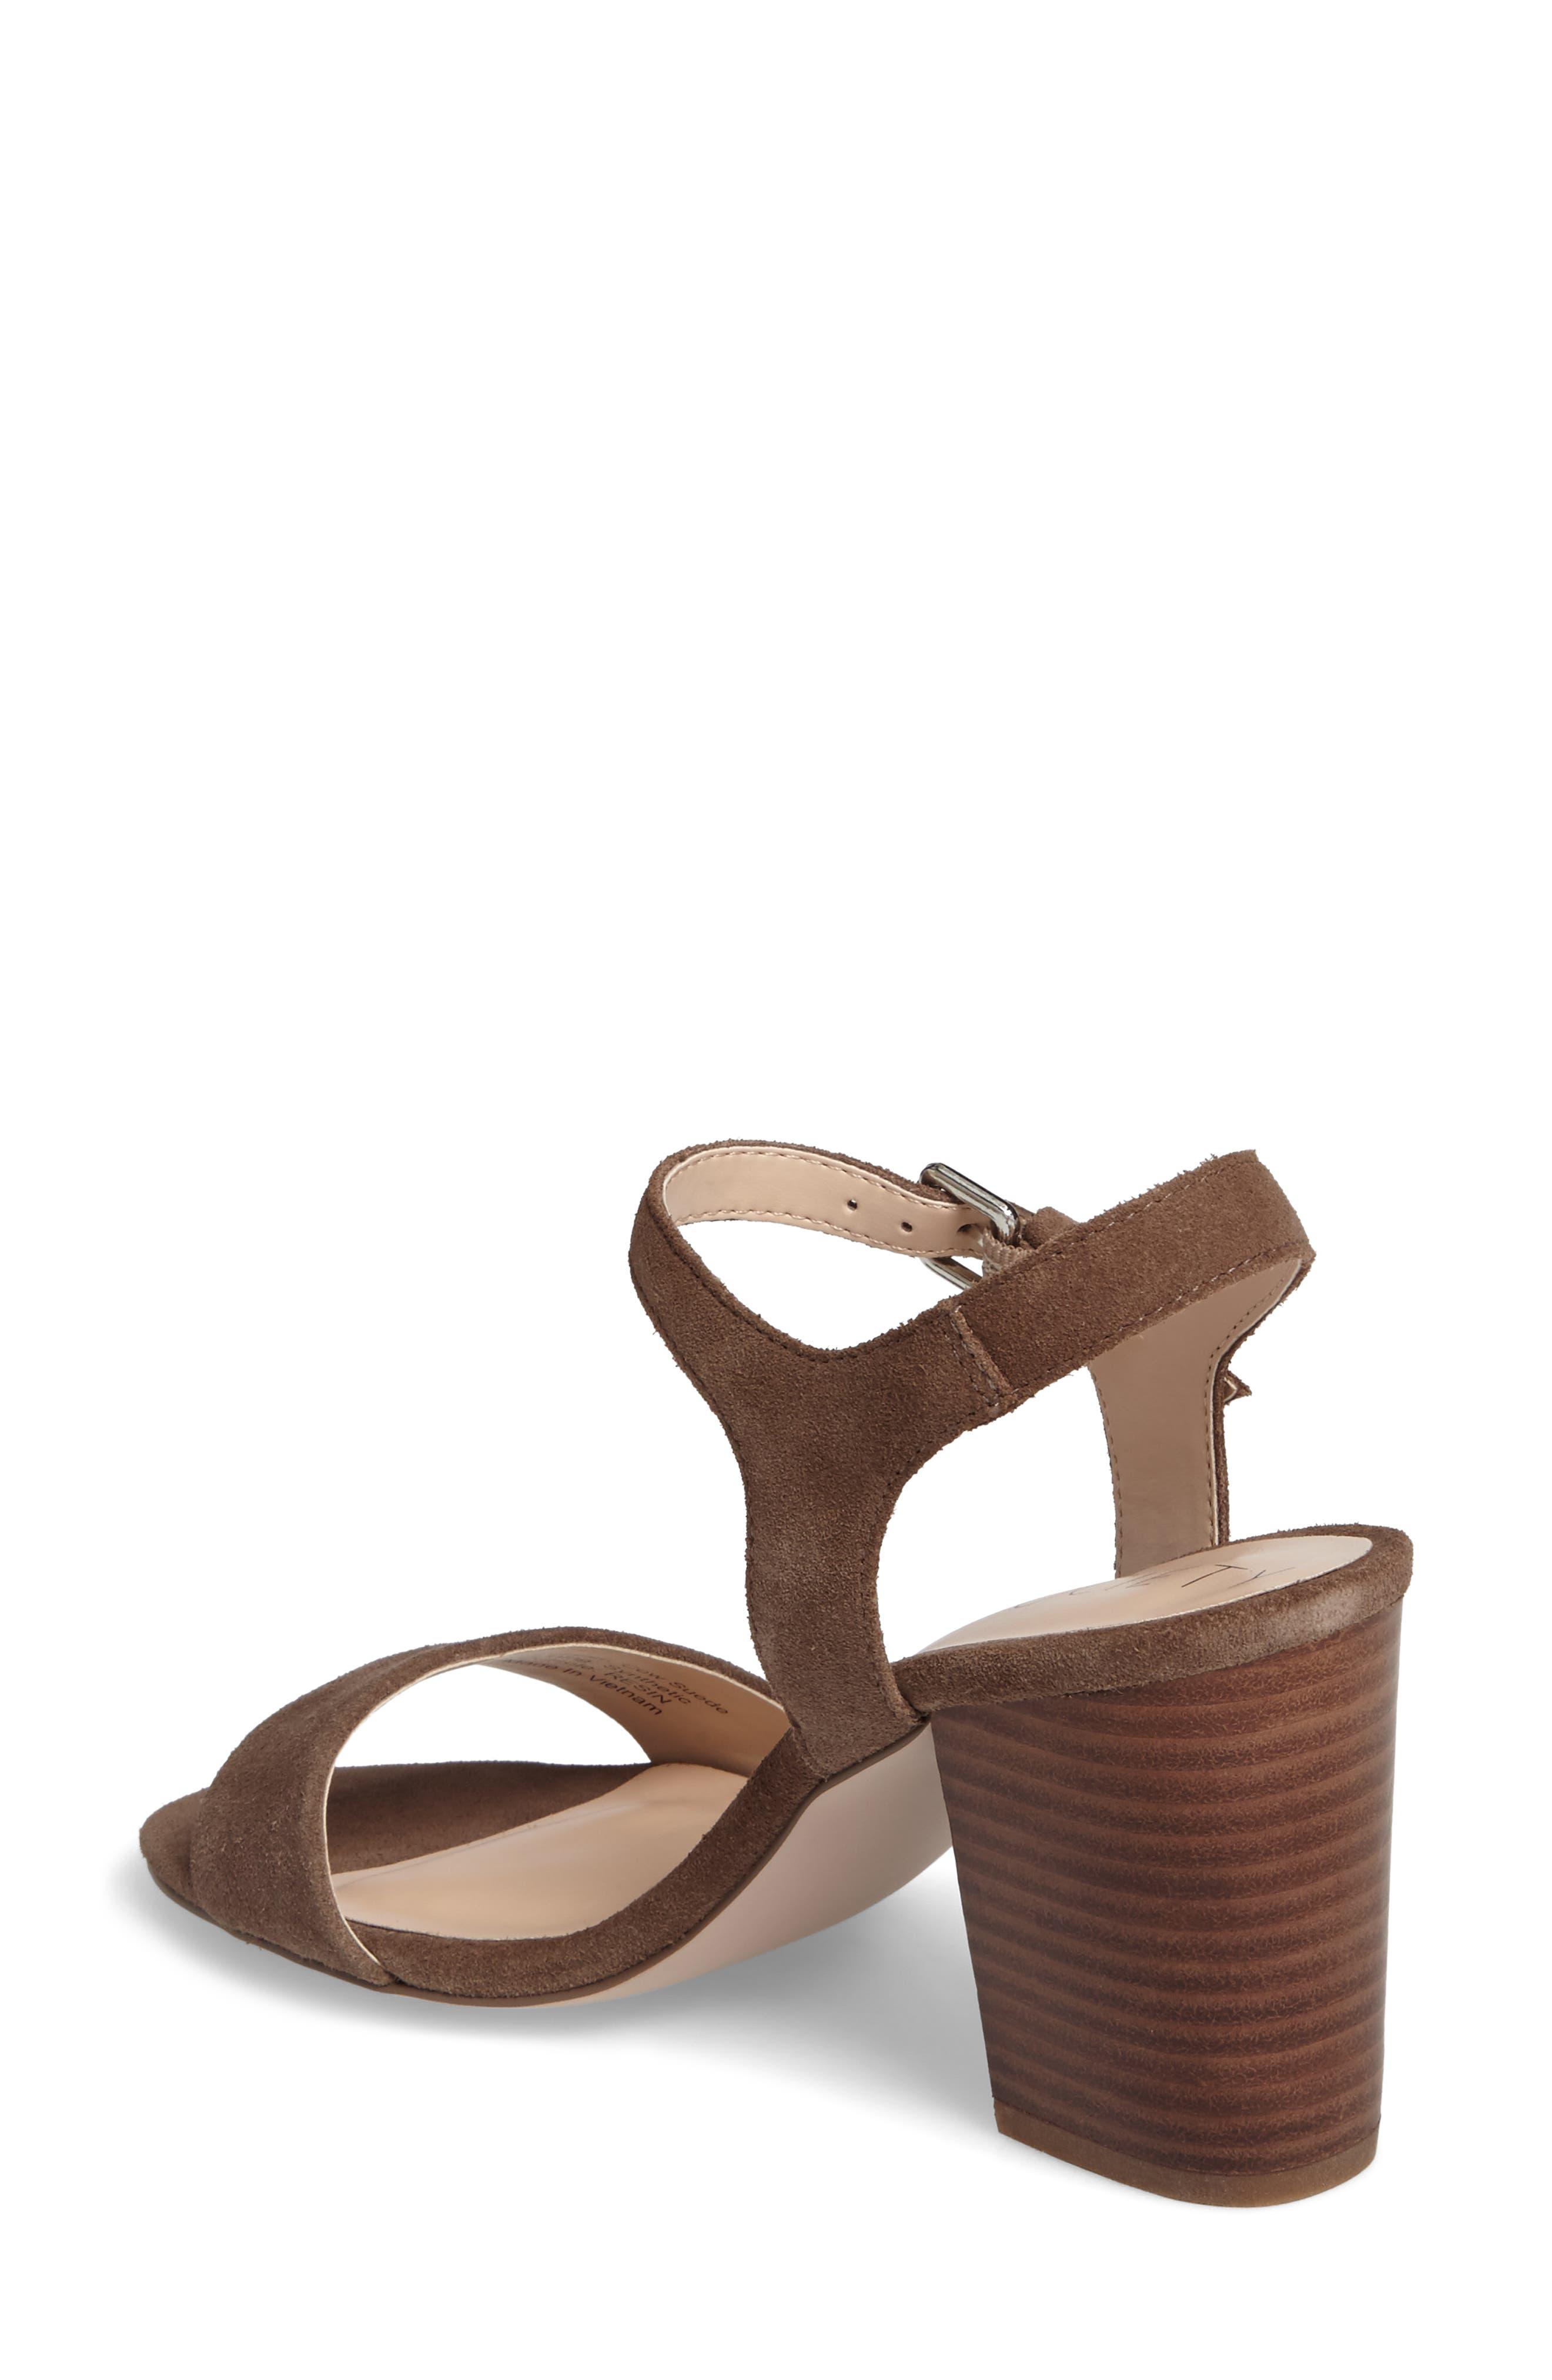 Alternate Image 2  - Sole Society 'Linny' Ankle Strap Sandal (Women)